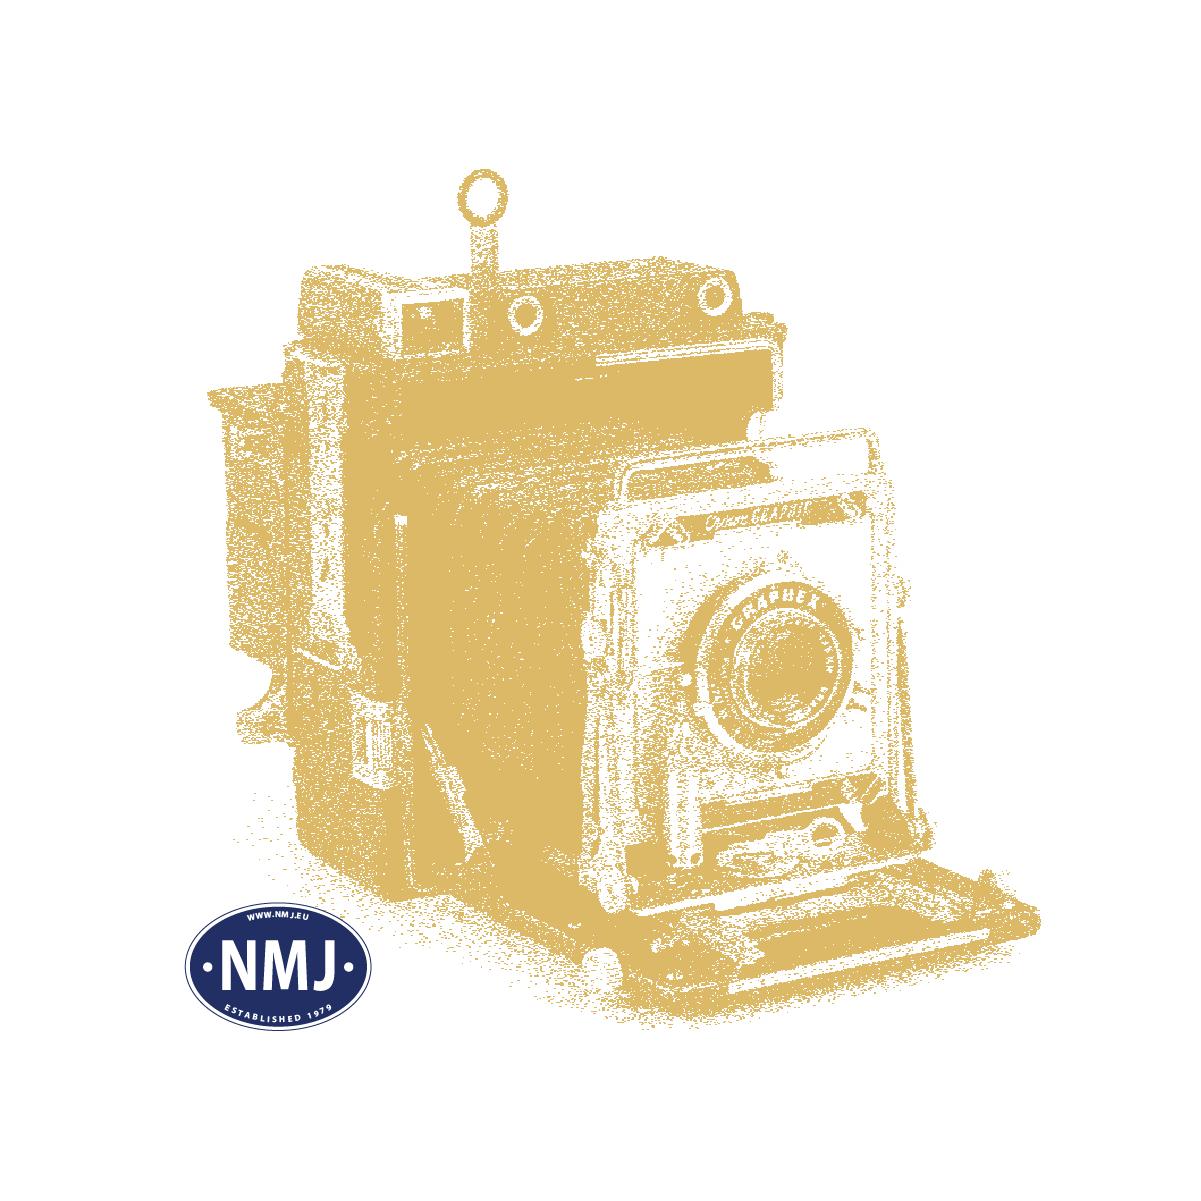 NMJT245002 - NMJ Topline NSB Di3.622 Gammeldesign (rotbraun), Spur 0, DCC Sound